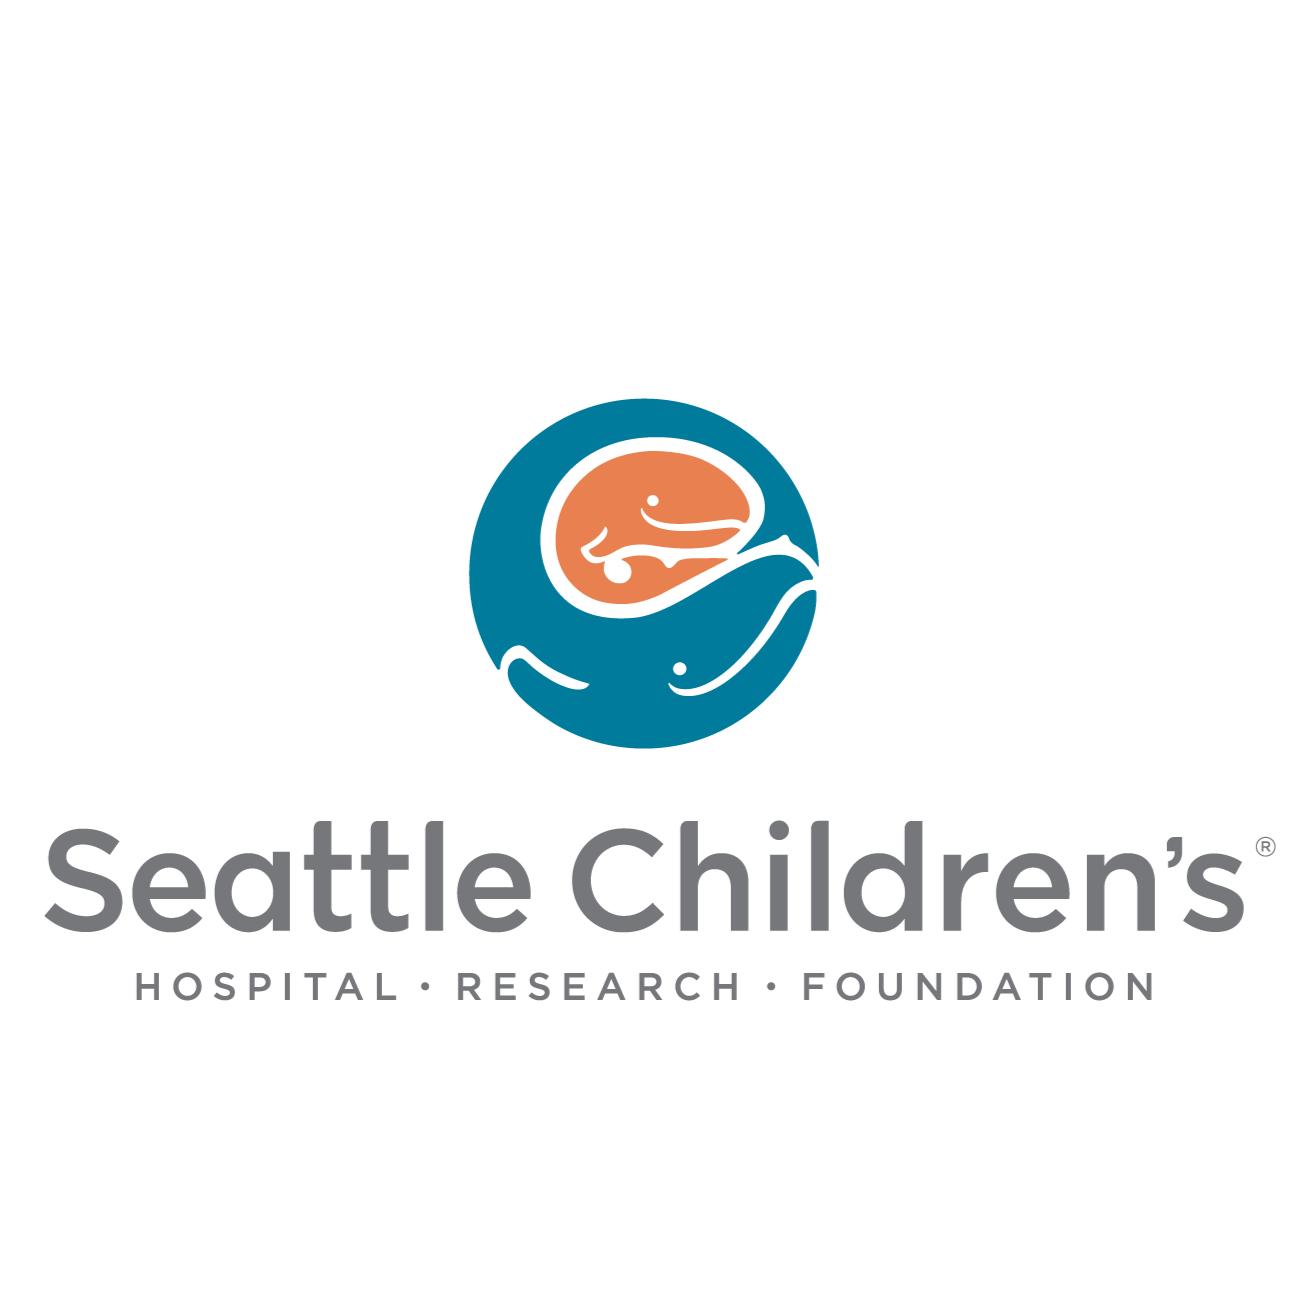 Seattle Childrens Hospital - Radiology | 4800 Sand Point Way NE, Seattle, WA, 98105 | +1 (206) 987-2089